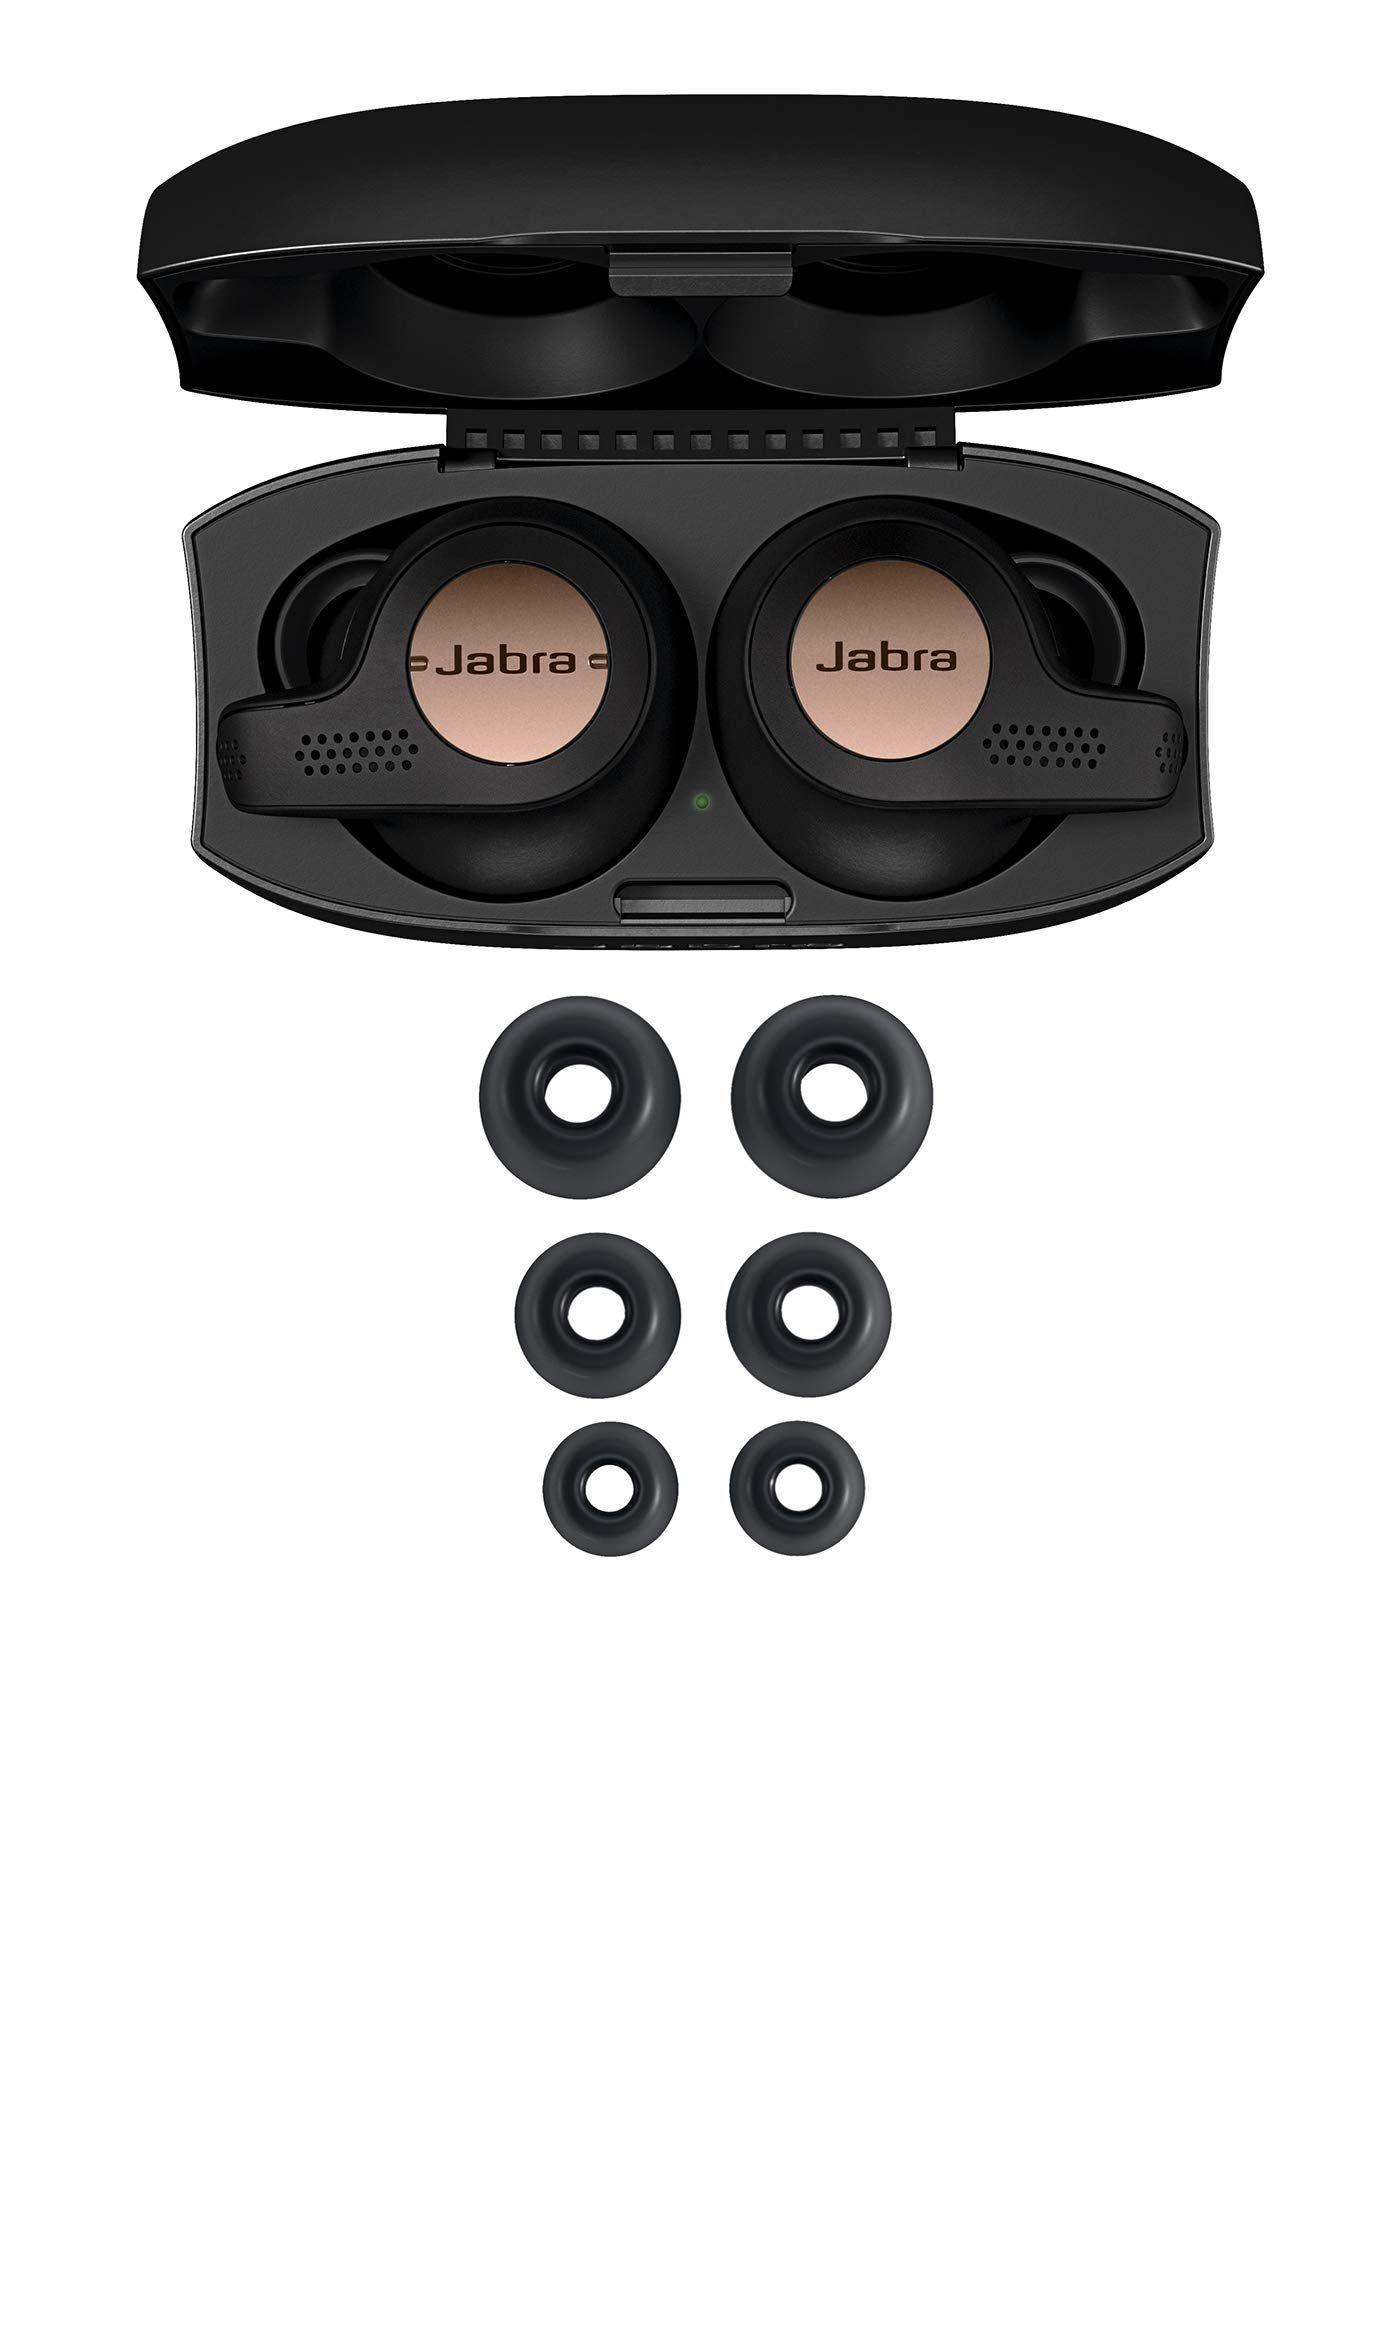 Jabra Elite Active 65t True Wireless Sports Earbuds with 3